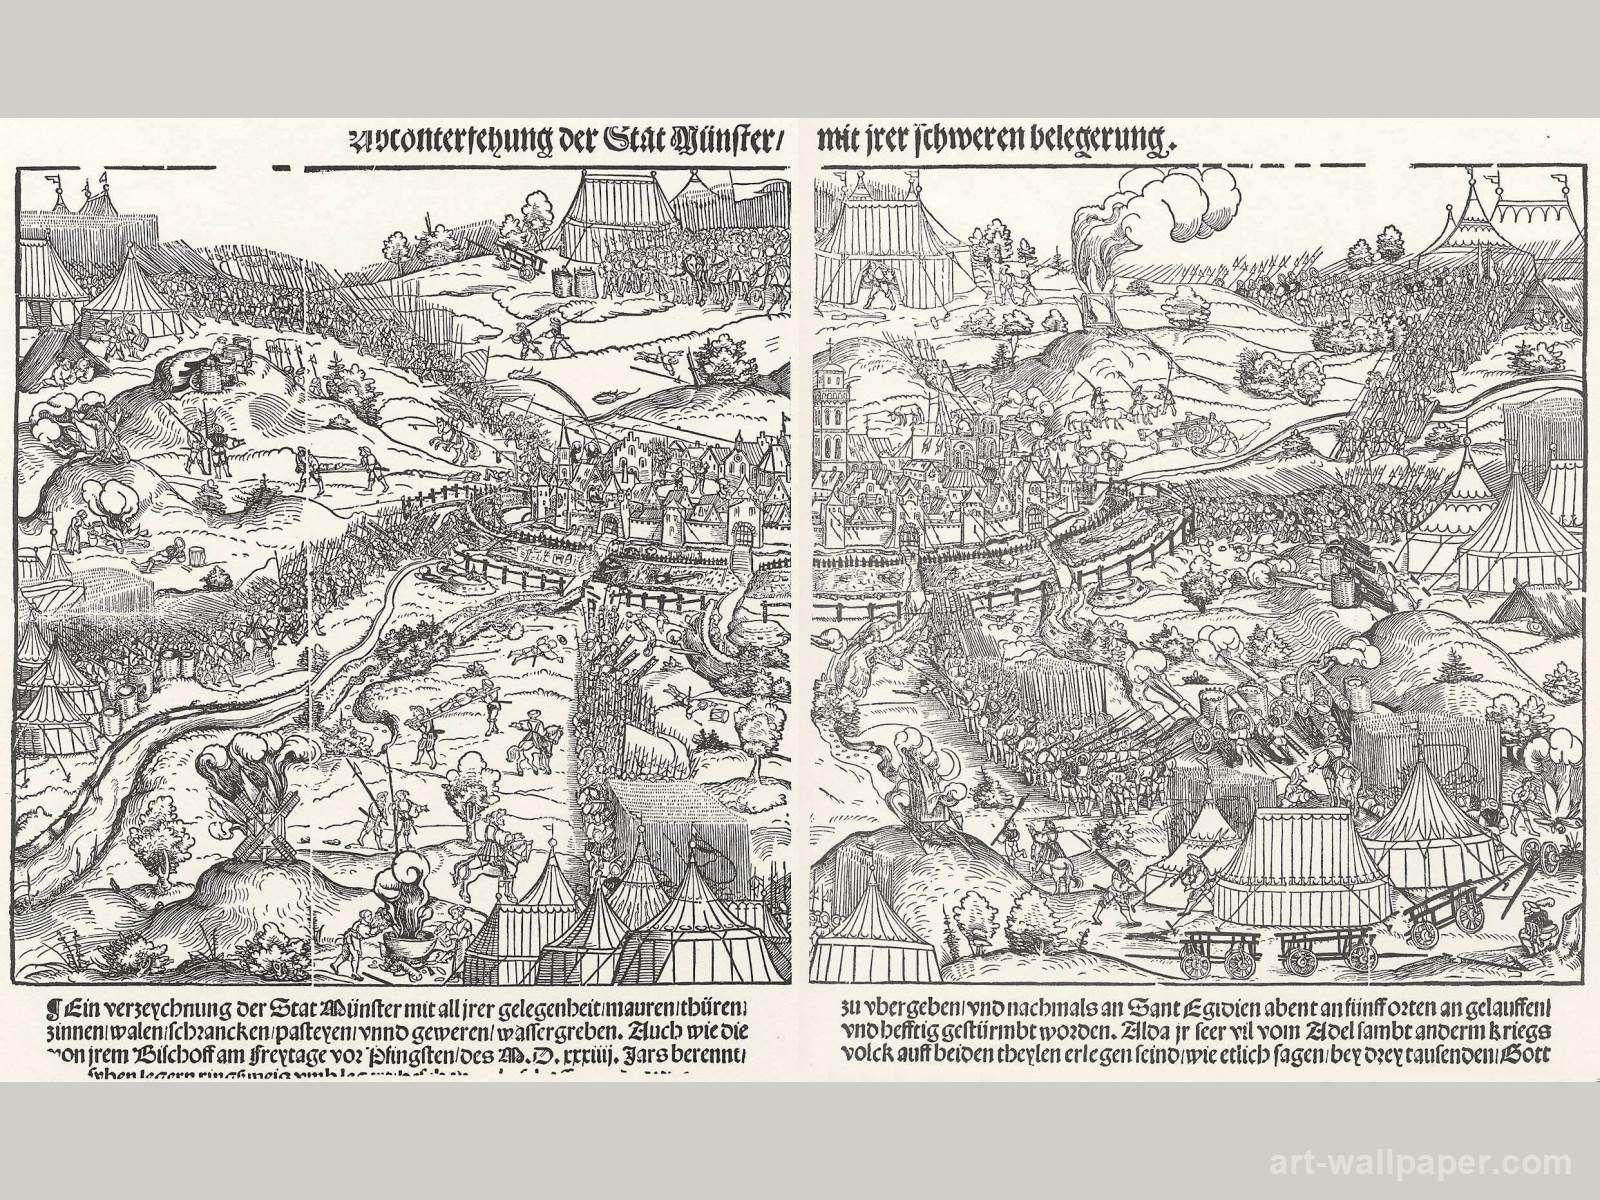 The Siege Of Munster Schoen Erhard Wallpapers History Nerd Vintage World Maps Munster